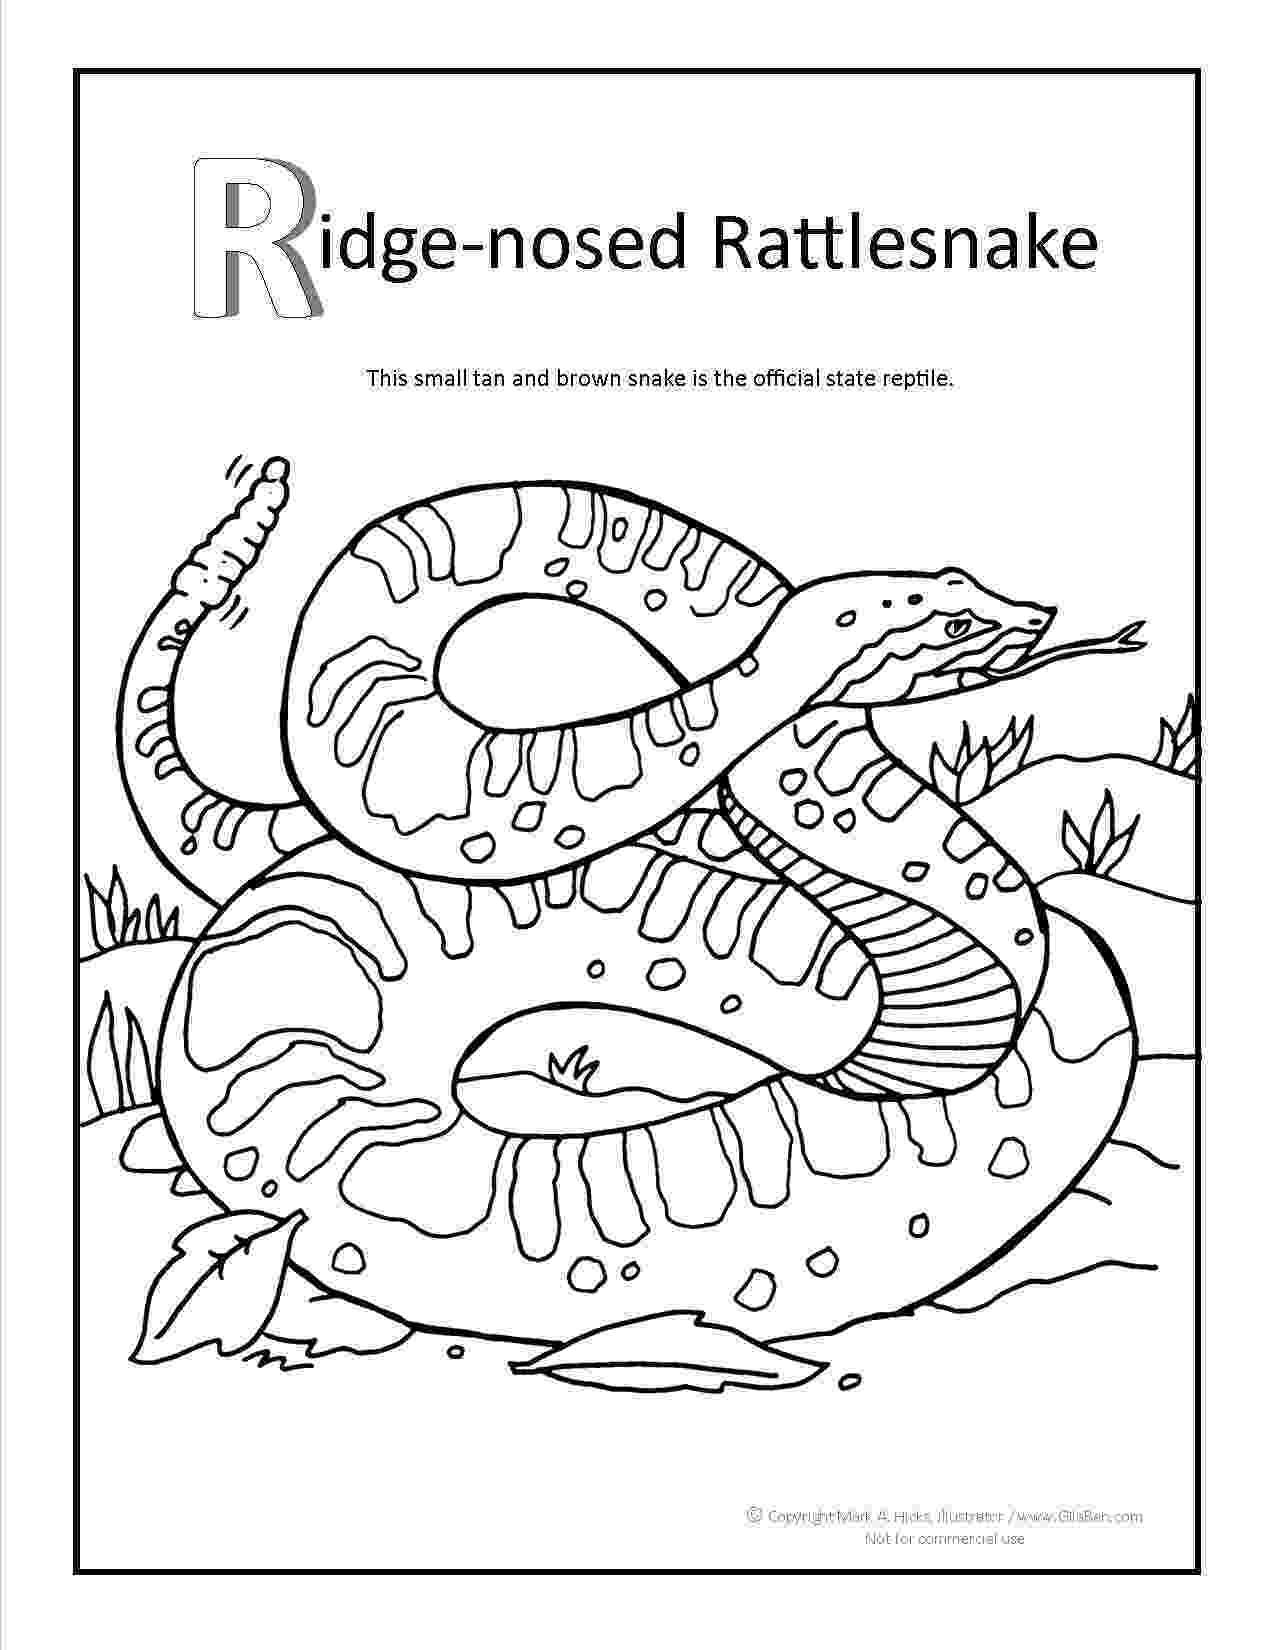 western diamondback rattlesnake coloring pages western diamondback rattlesnake coloring page coloring pages diamondback coloring pages western rattlesnake